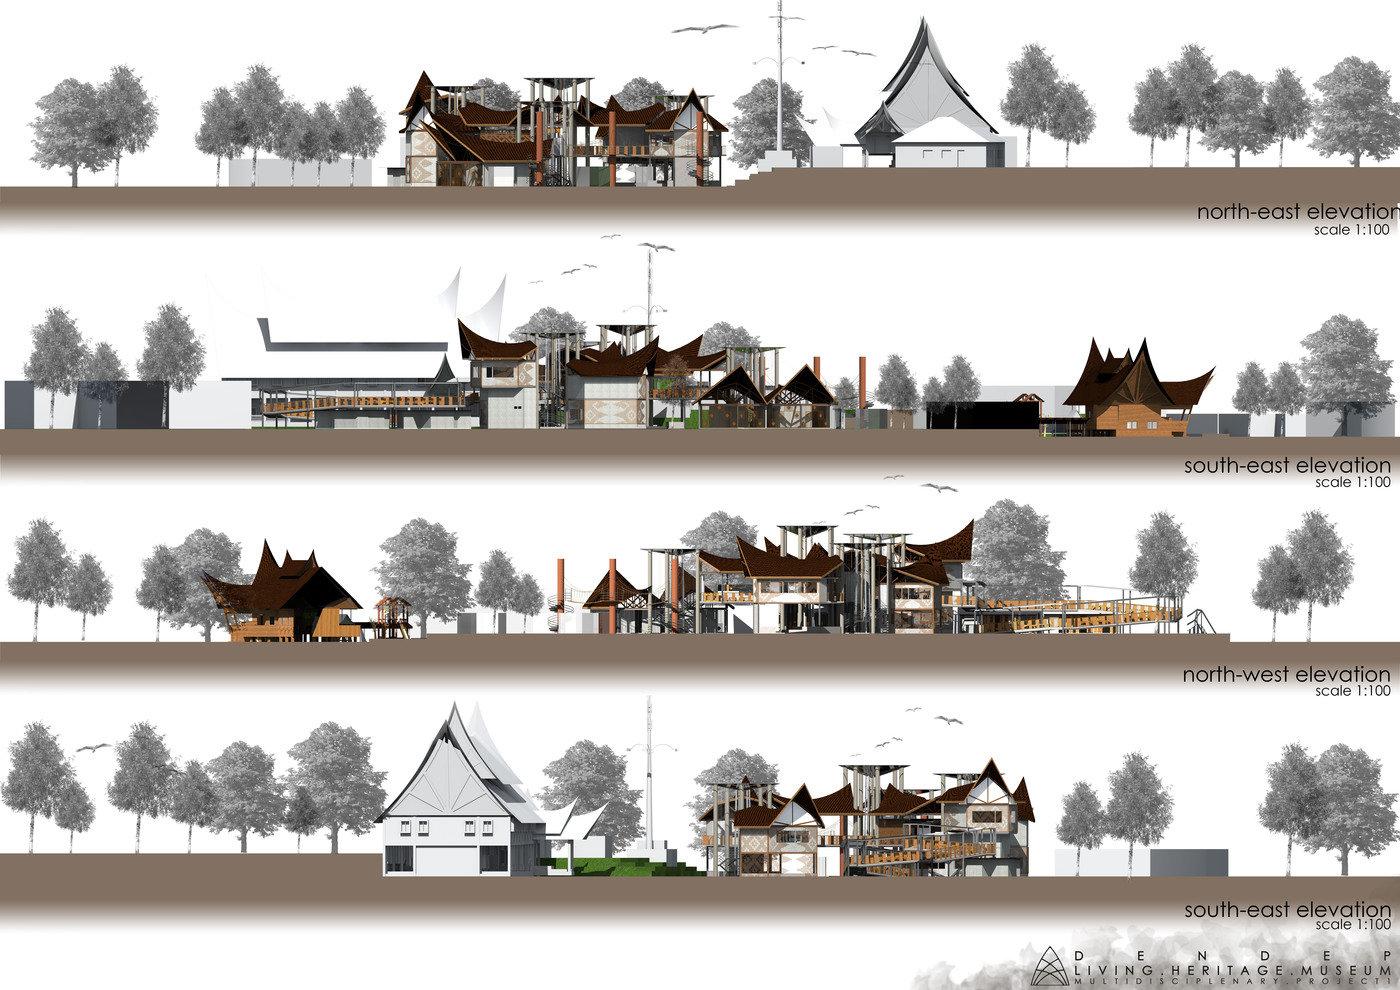 Living Heritage Museum by Nushi Mahfodz at Coroflot com